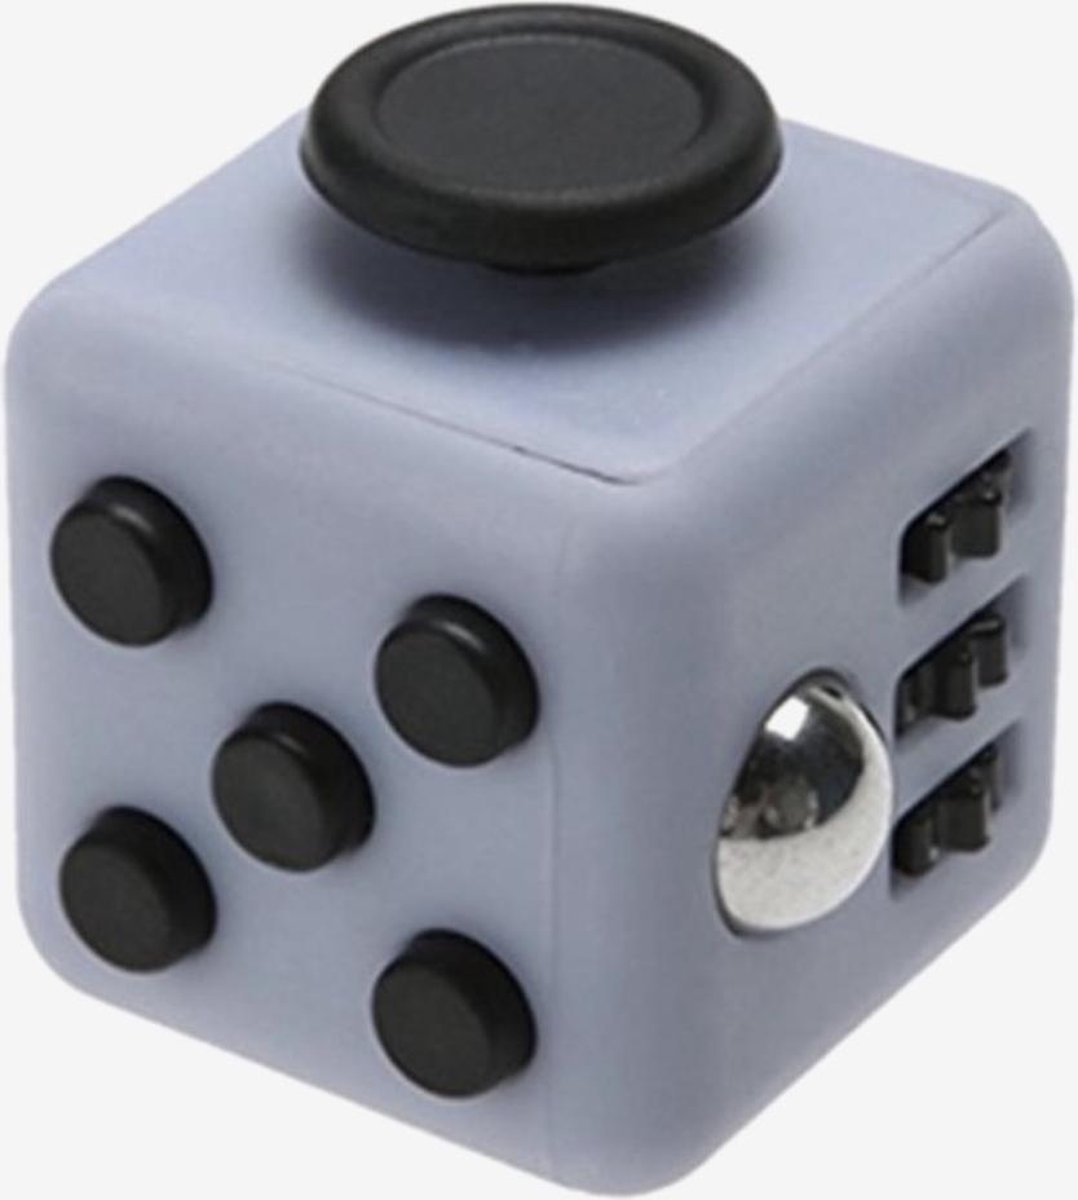 Fidget Cube tegen Stress - Fidget Toys - Speelgoed - Grijs/zwart